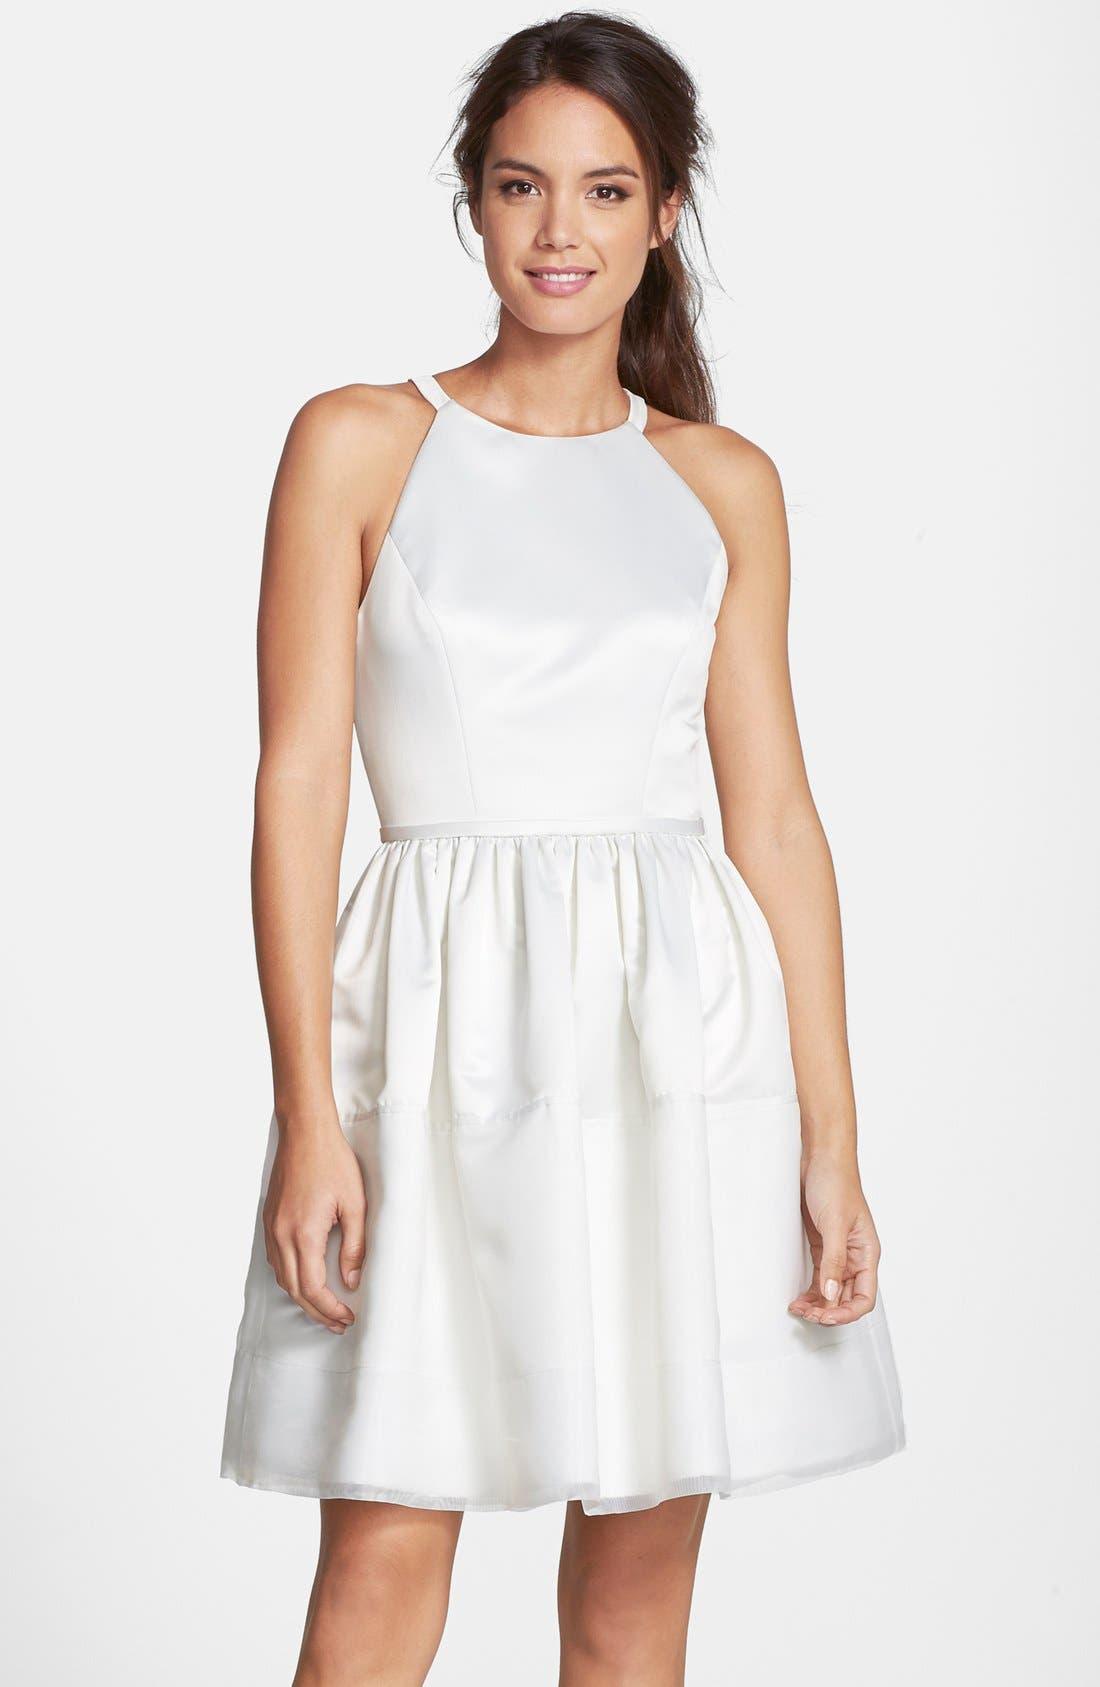 Alternate Image 1 Selected - ERIN erin fetherston 'Savannah' Satin Fit & Flare Dress